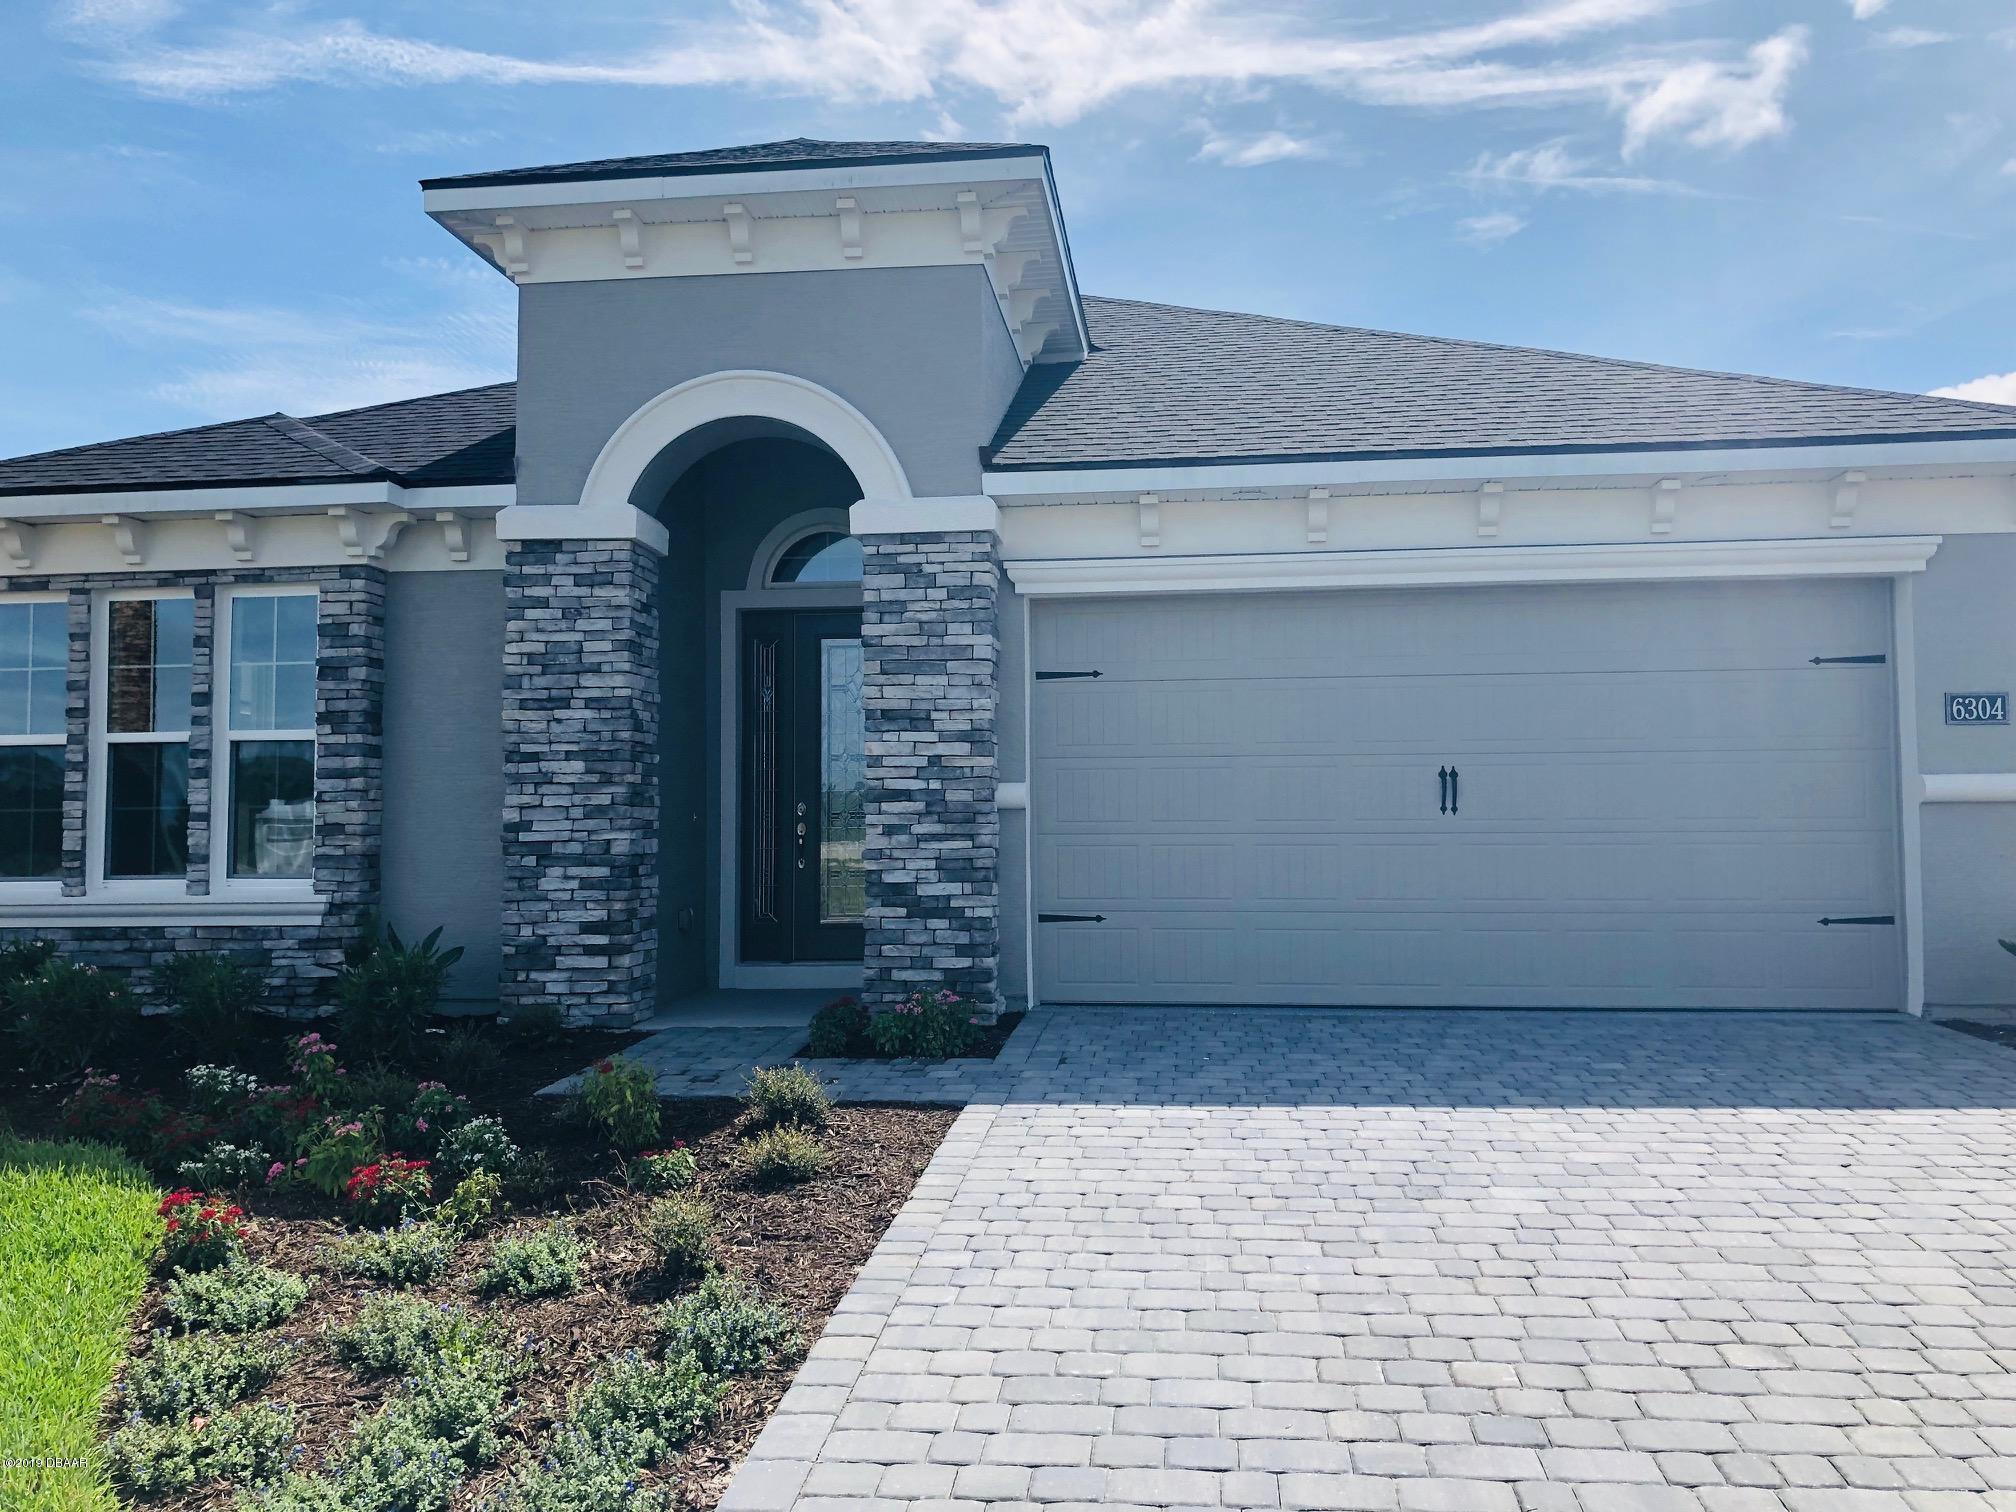 Photo of 6304 E. Fallsgrove Lane, Port Orange, FL 32128